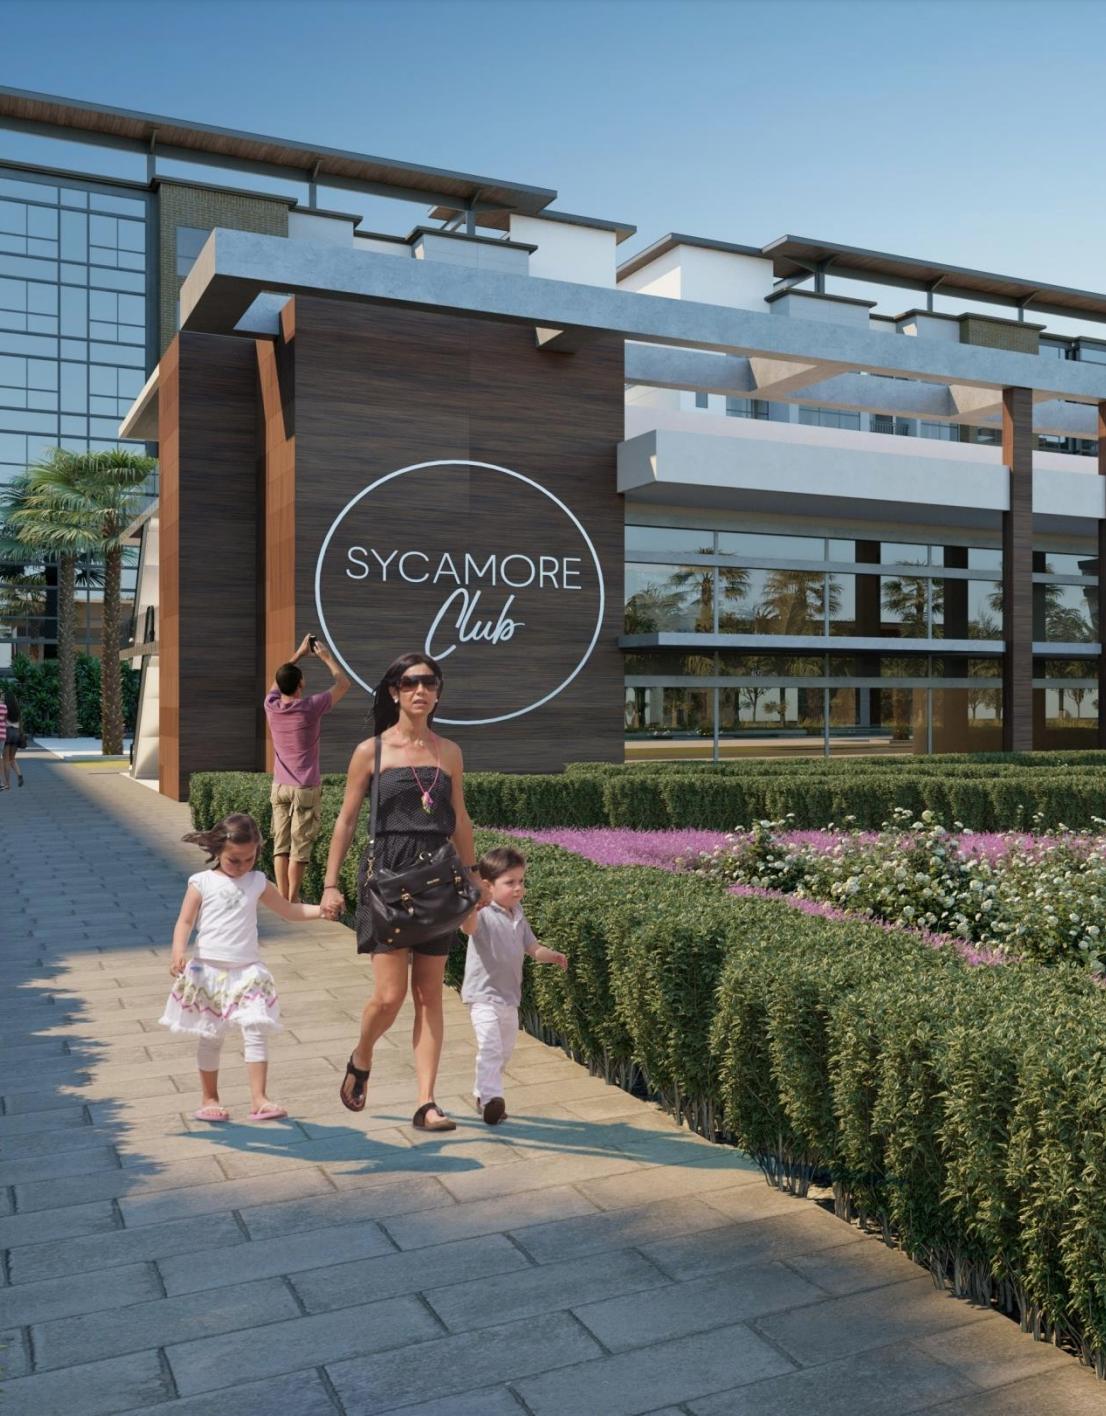 skyview image of Sycamore Orlando Resort